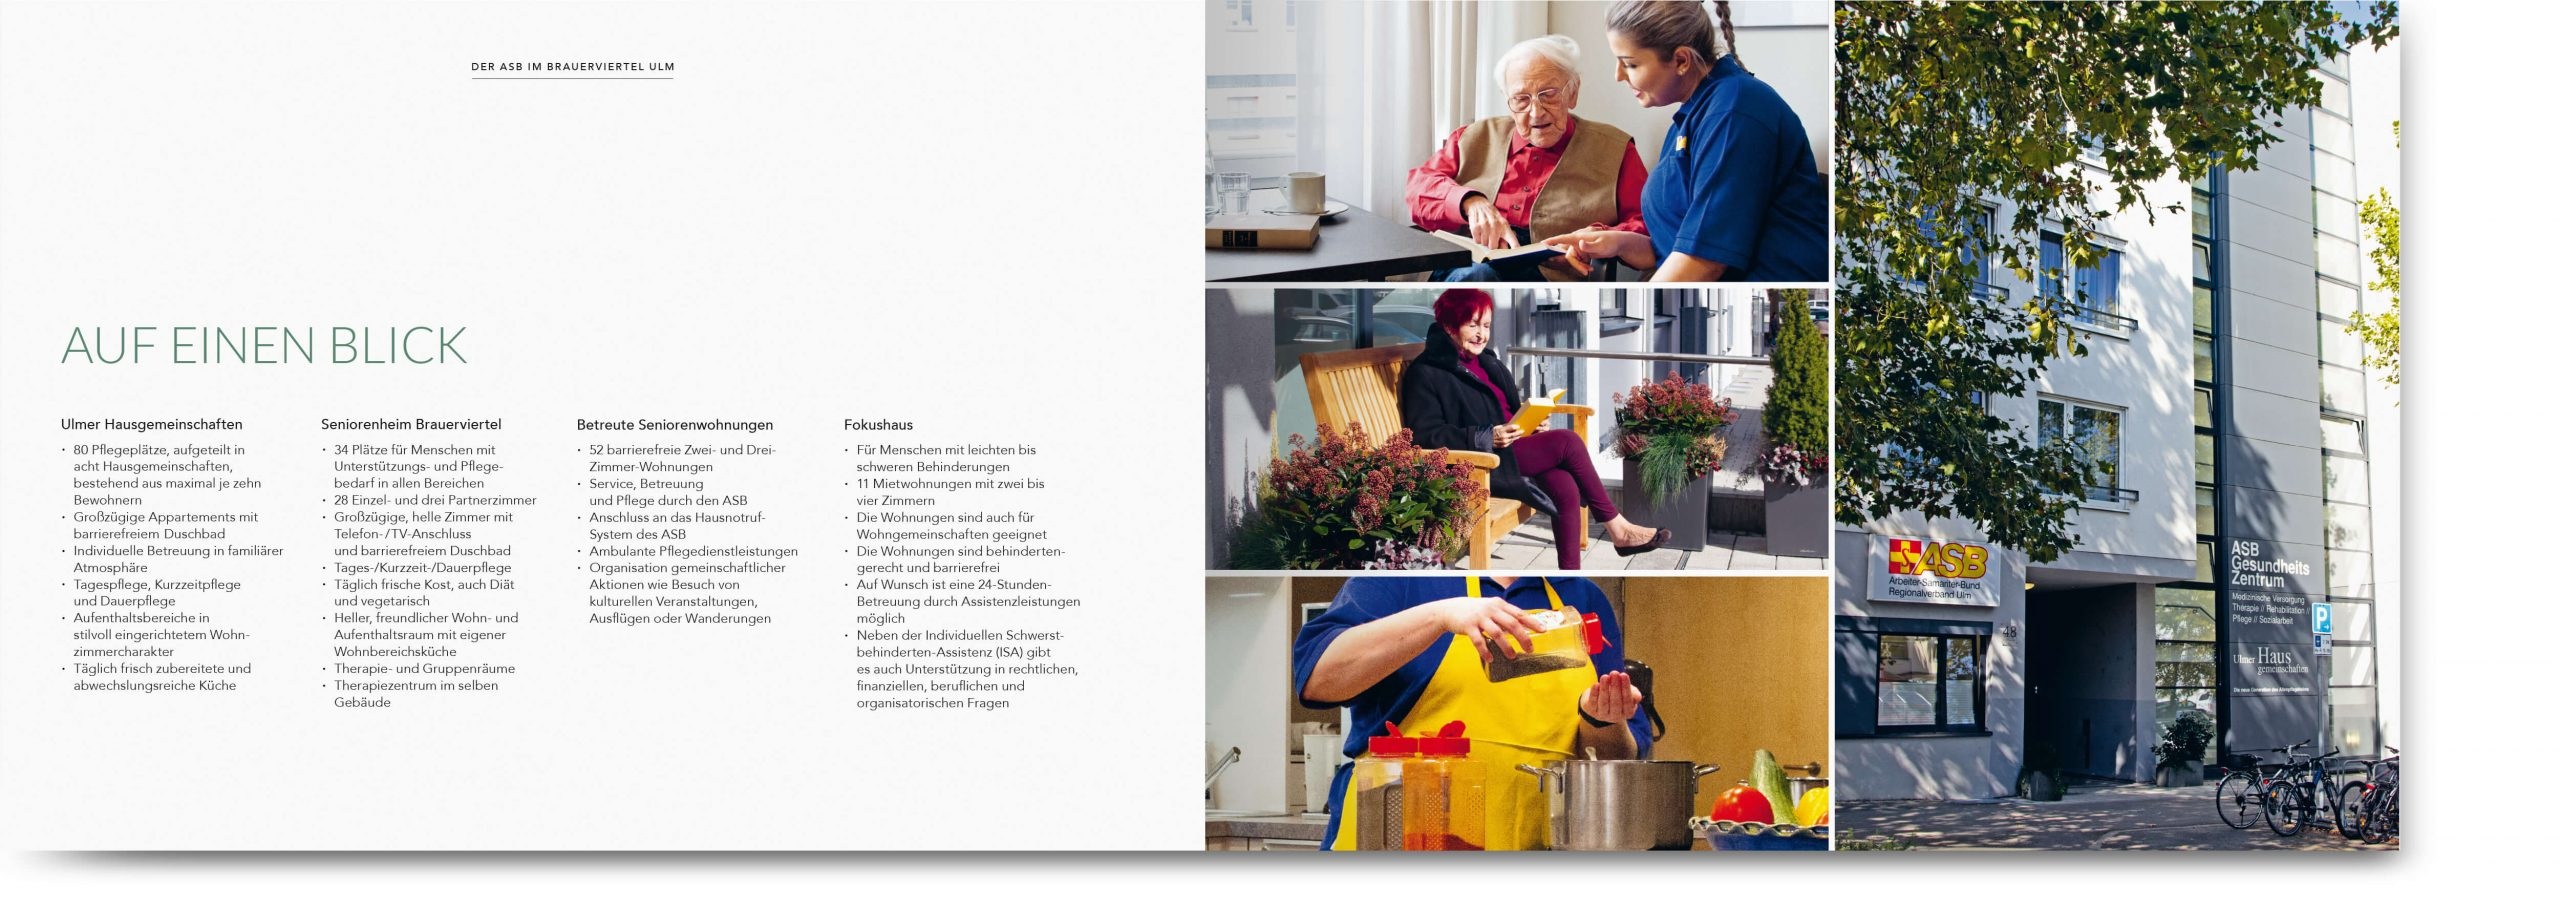 fh-web-asb-broschüren-ulm-7-scaled.jpg